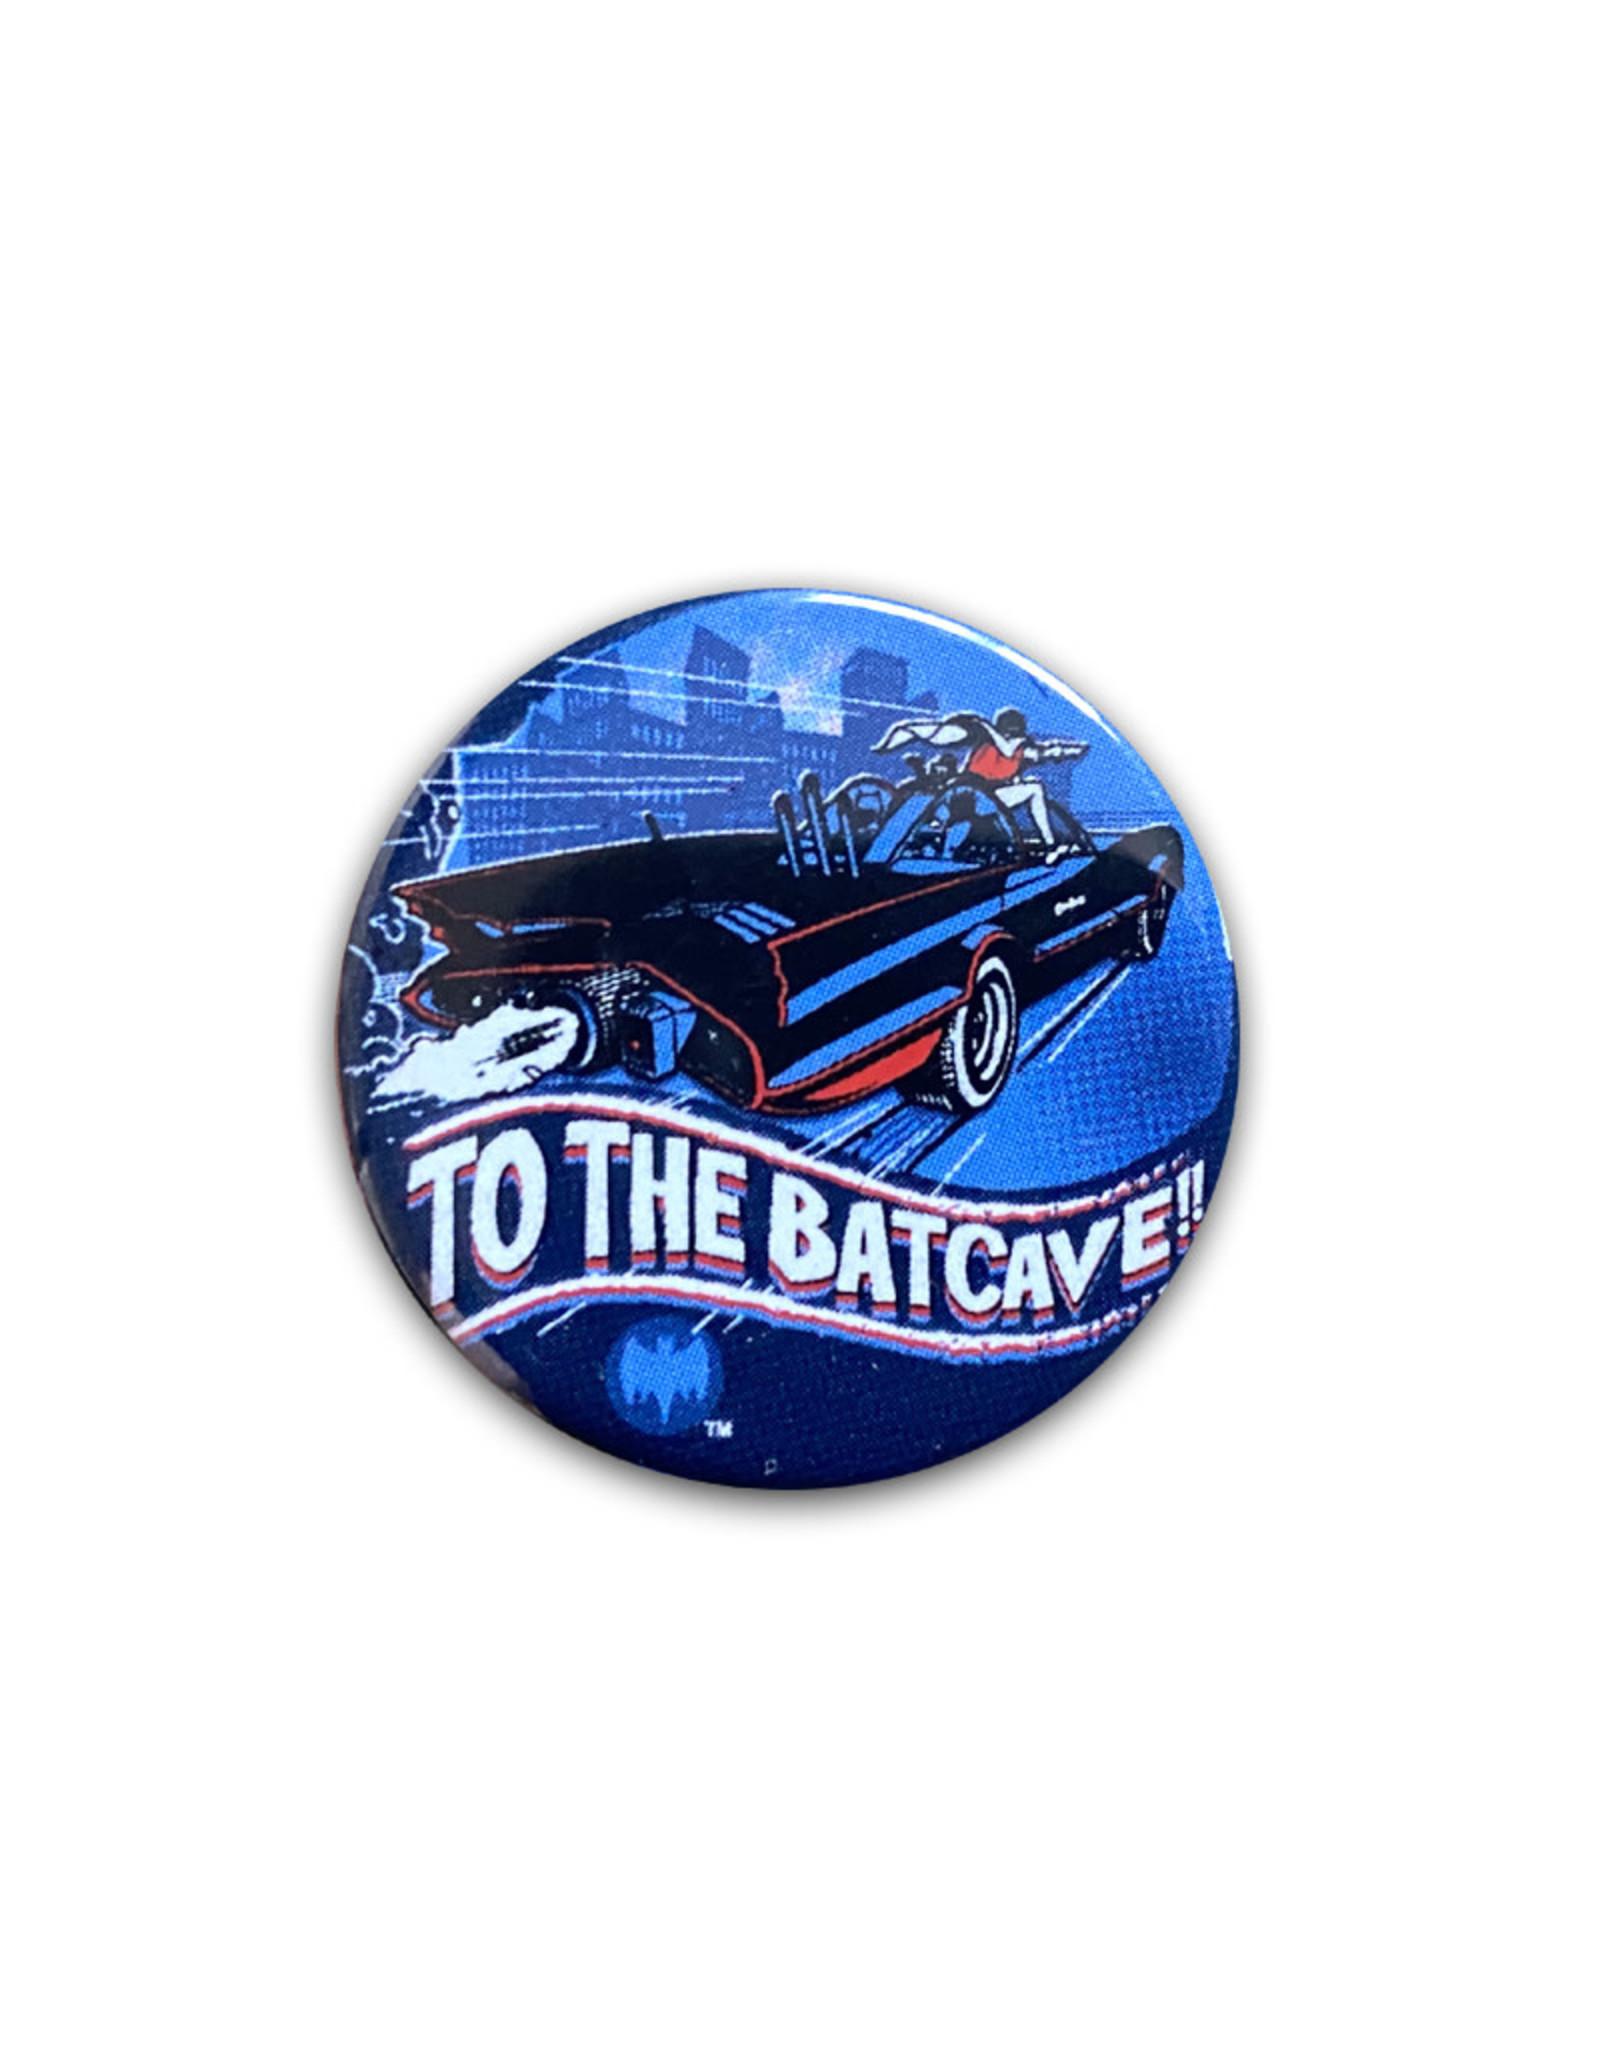 Dc comics DC Comics ( Button ) To The Batcave